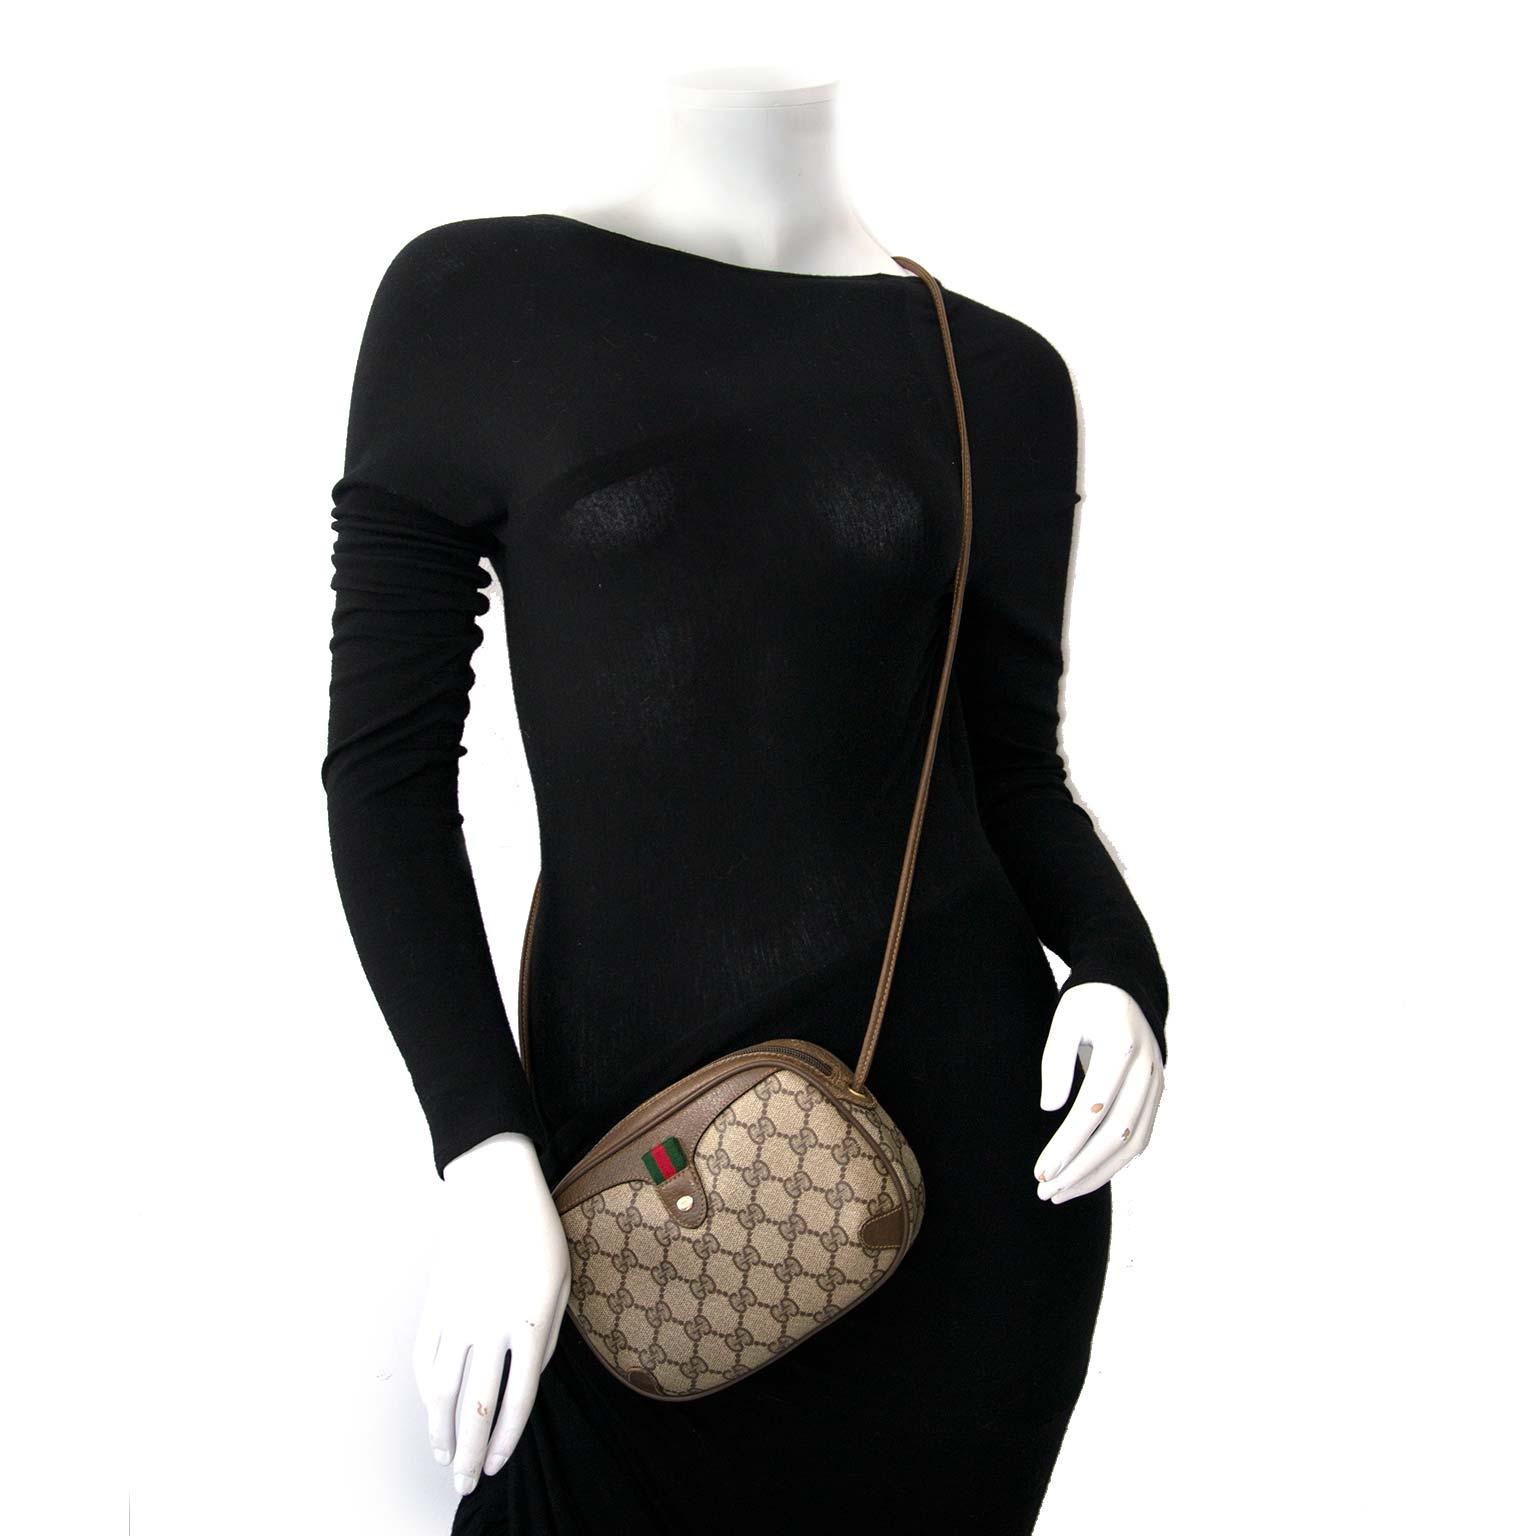 Gucci Vintage GG Monogram Mini Supreme Crossbody Bag